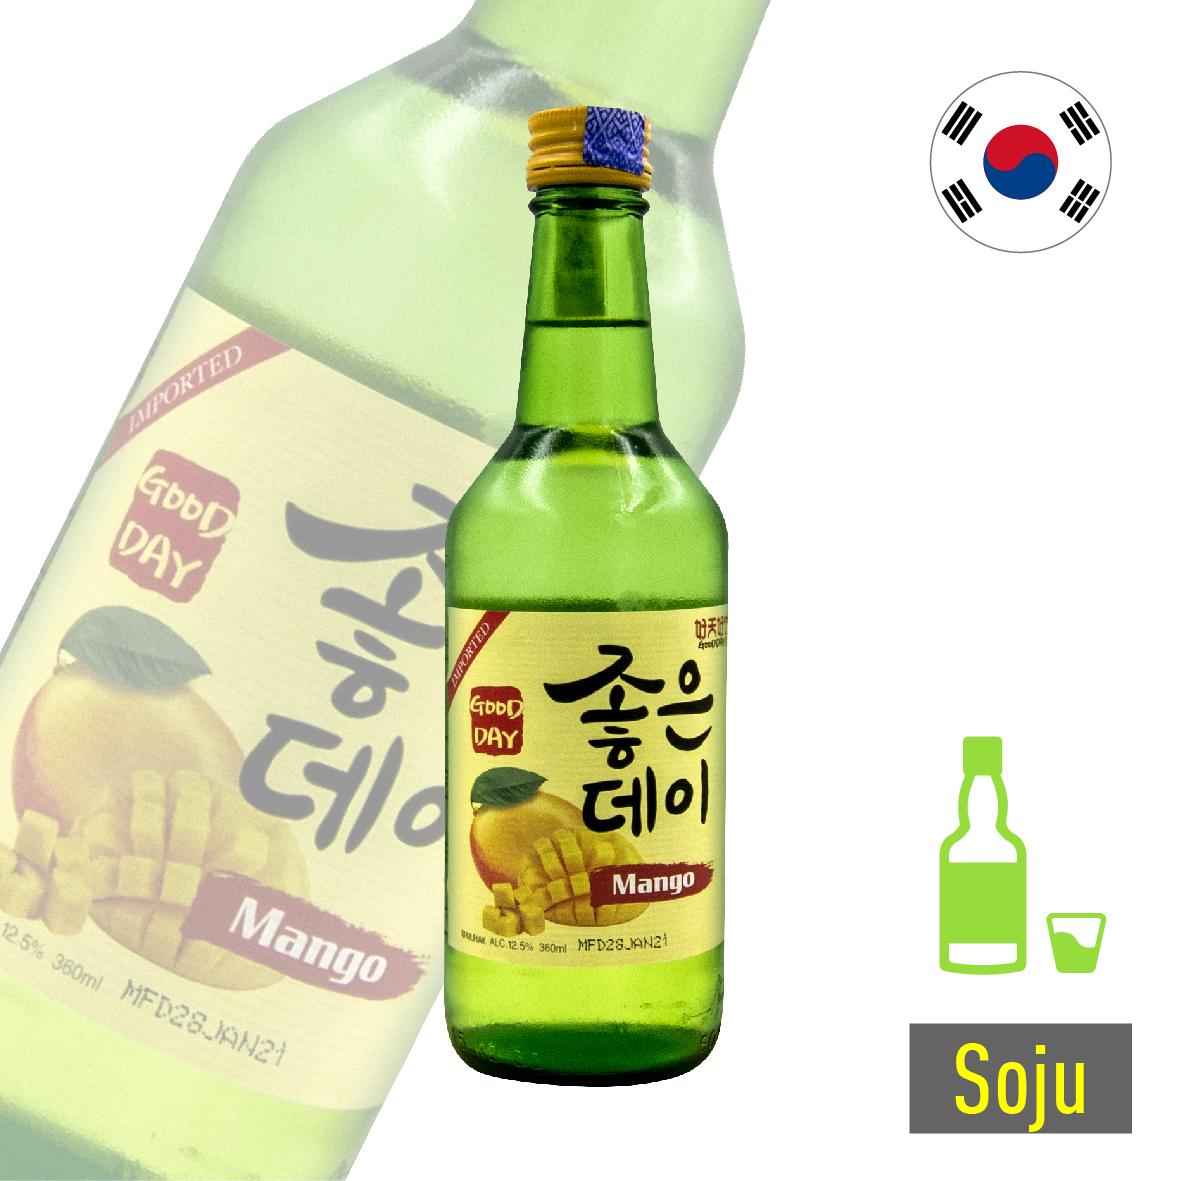 14-GooddaySoju-Mango-Korea-01.jpg